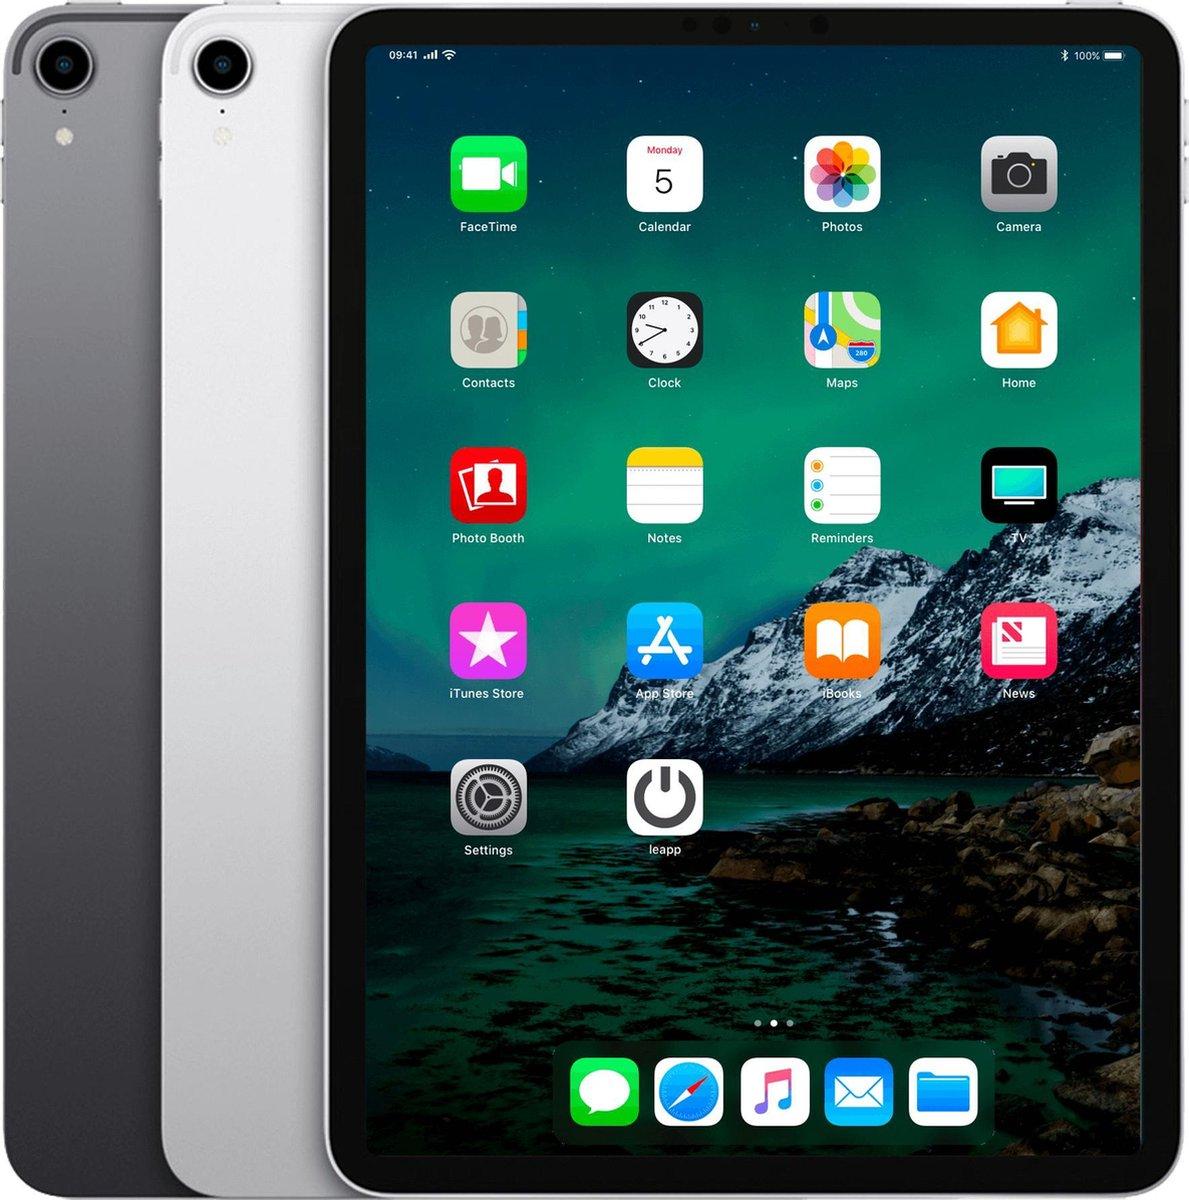 Apple iPad Pro 3 12.9 inch - 64GB - Wi-Fi - Space Gray - B-grade